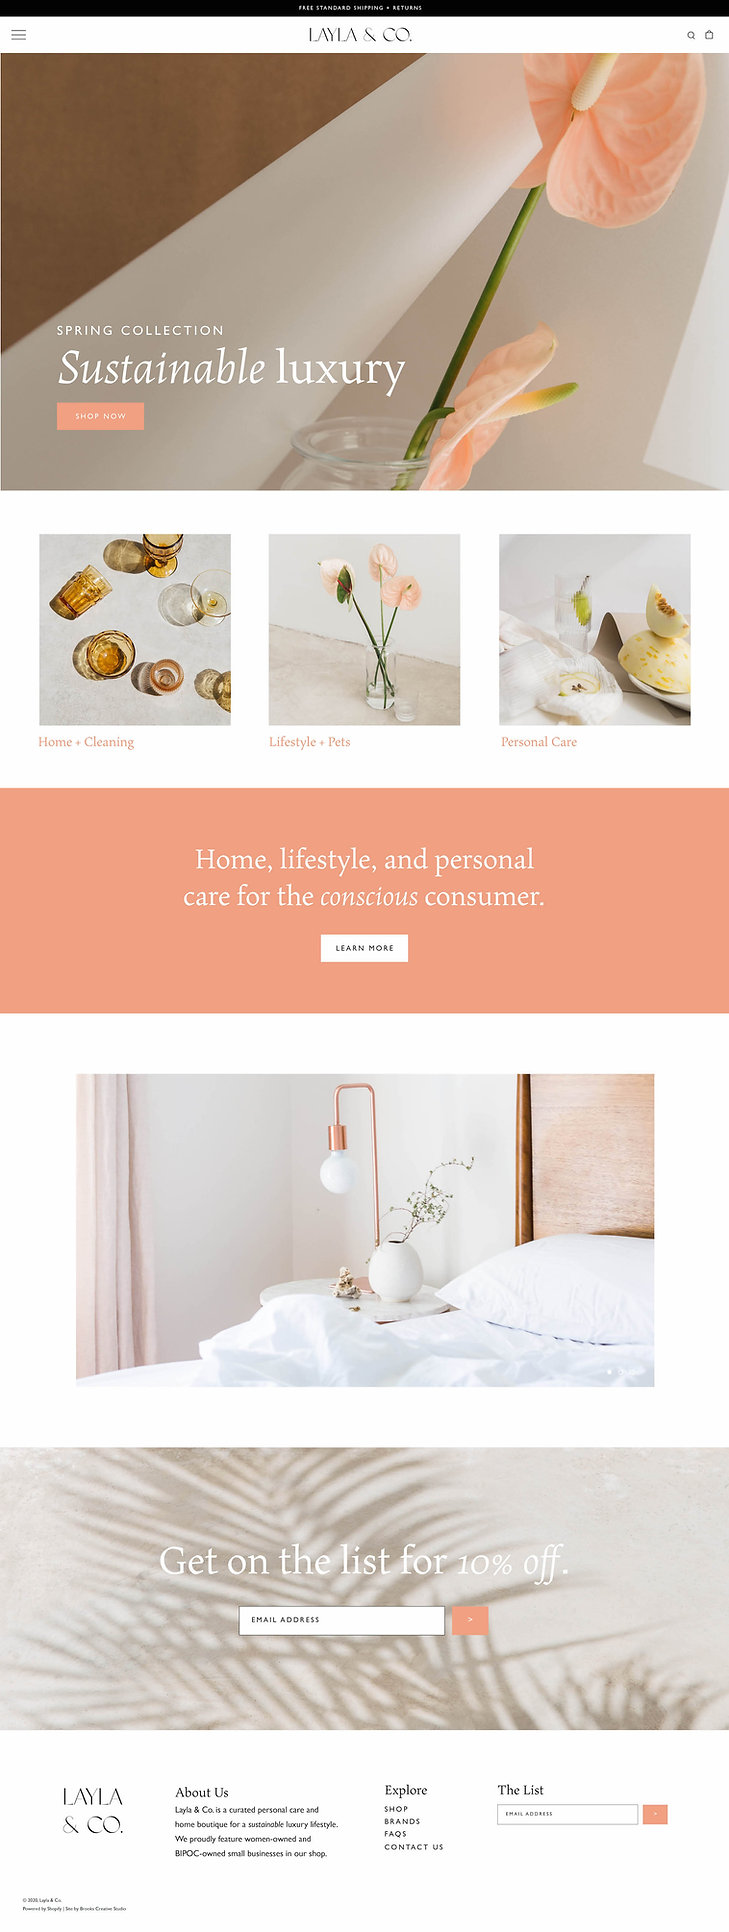 Shopify web design for online boutique